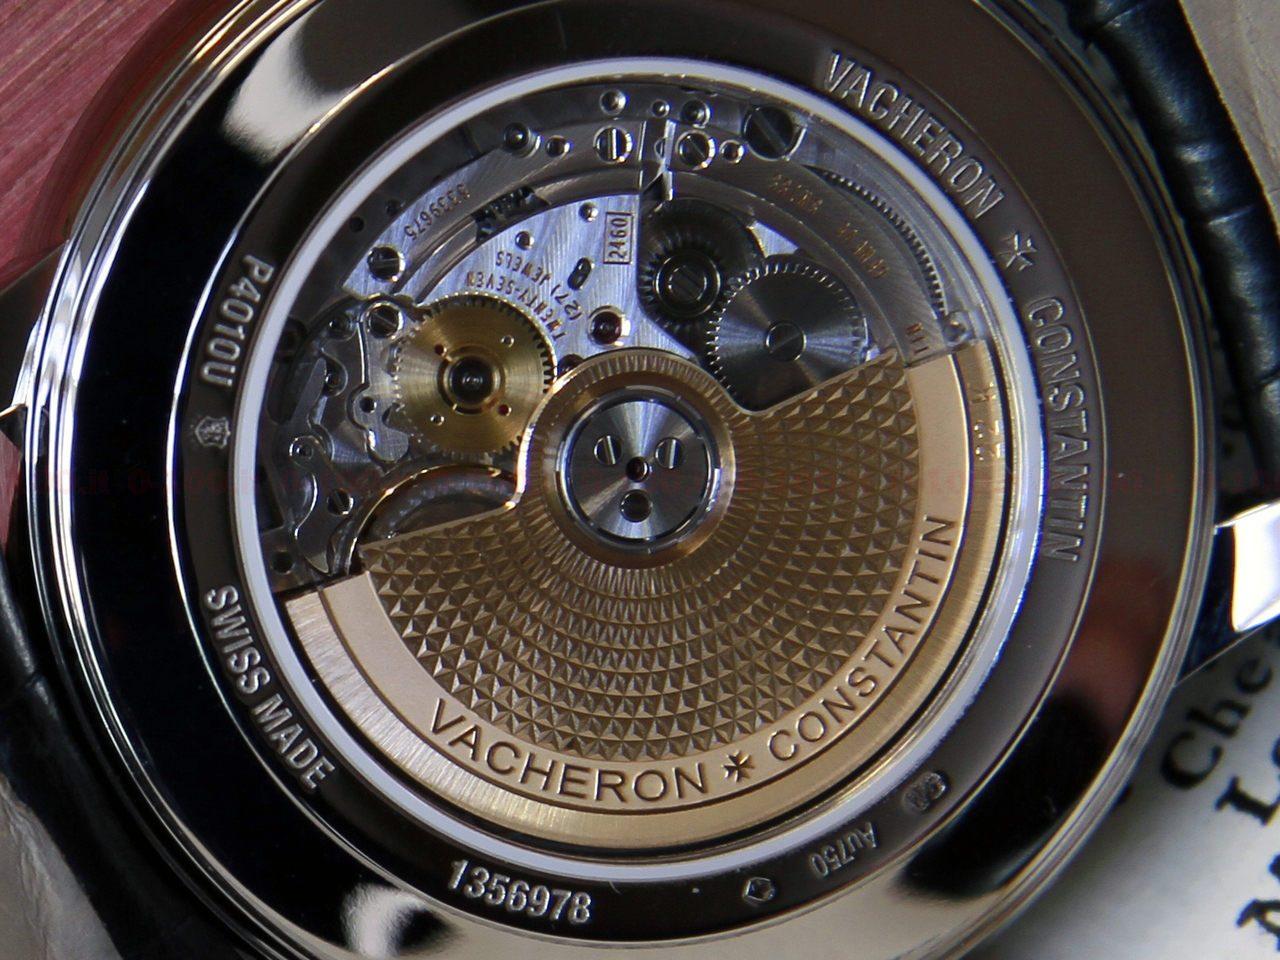 test-watch-sihh-2017-vacheron-constantin-patrimony-fasi-lunari-e-calendario-retrogrado-ref-4010u000g-b330-prezzo-price_0-10036